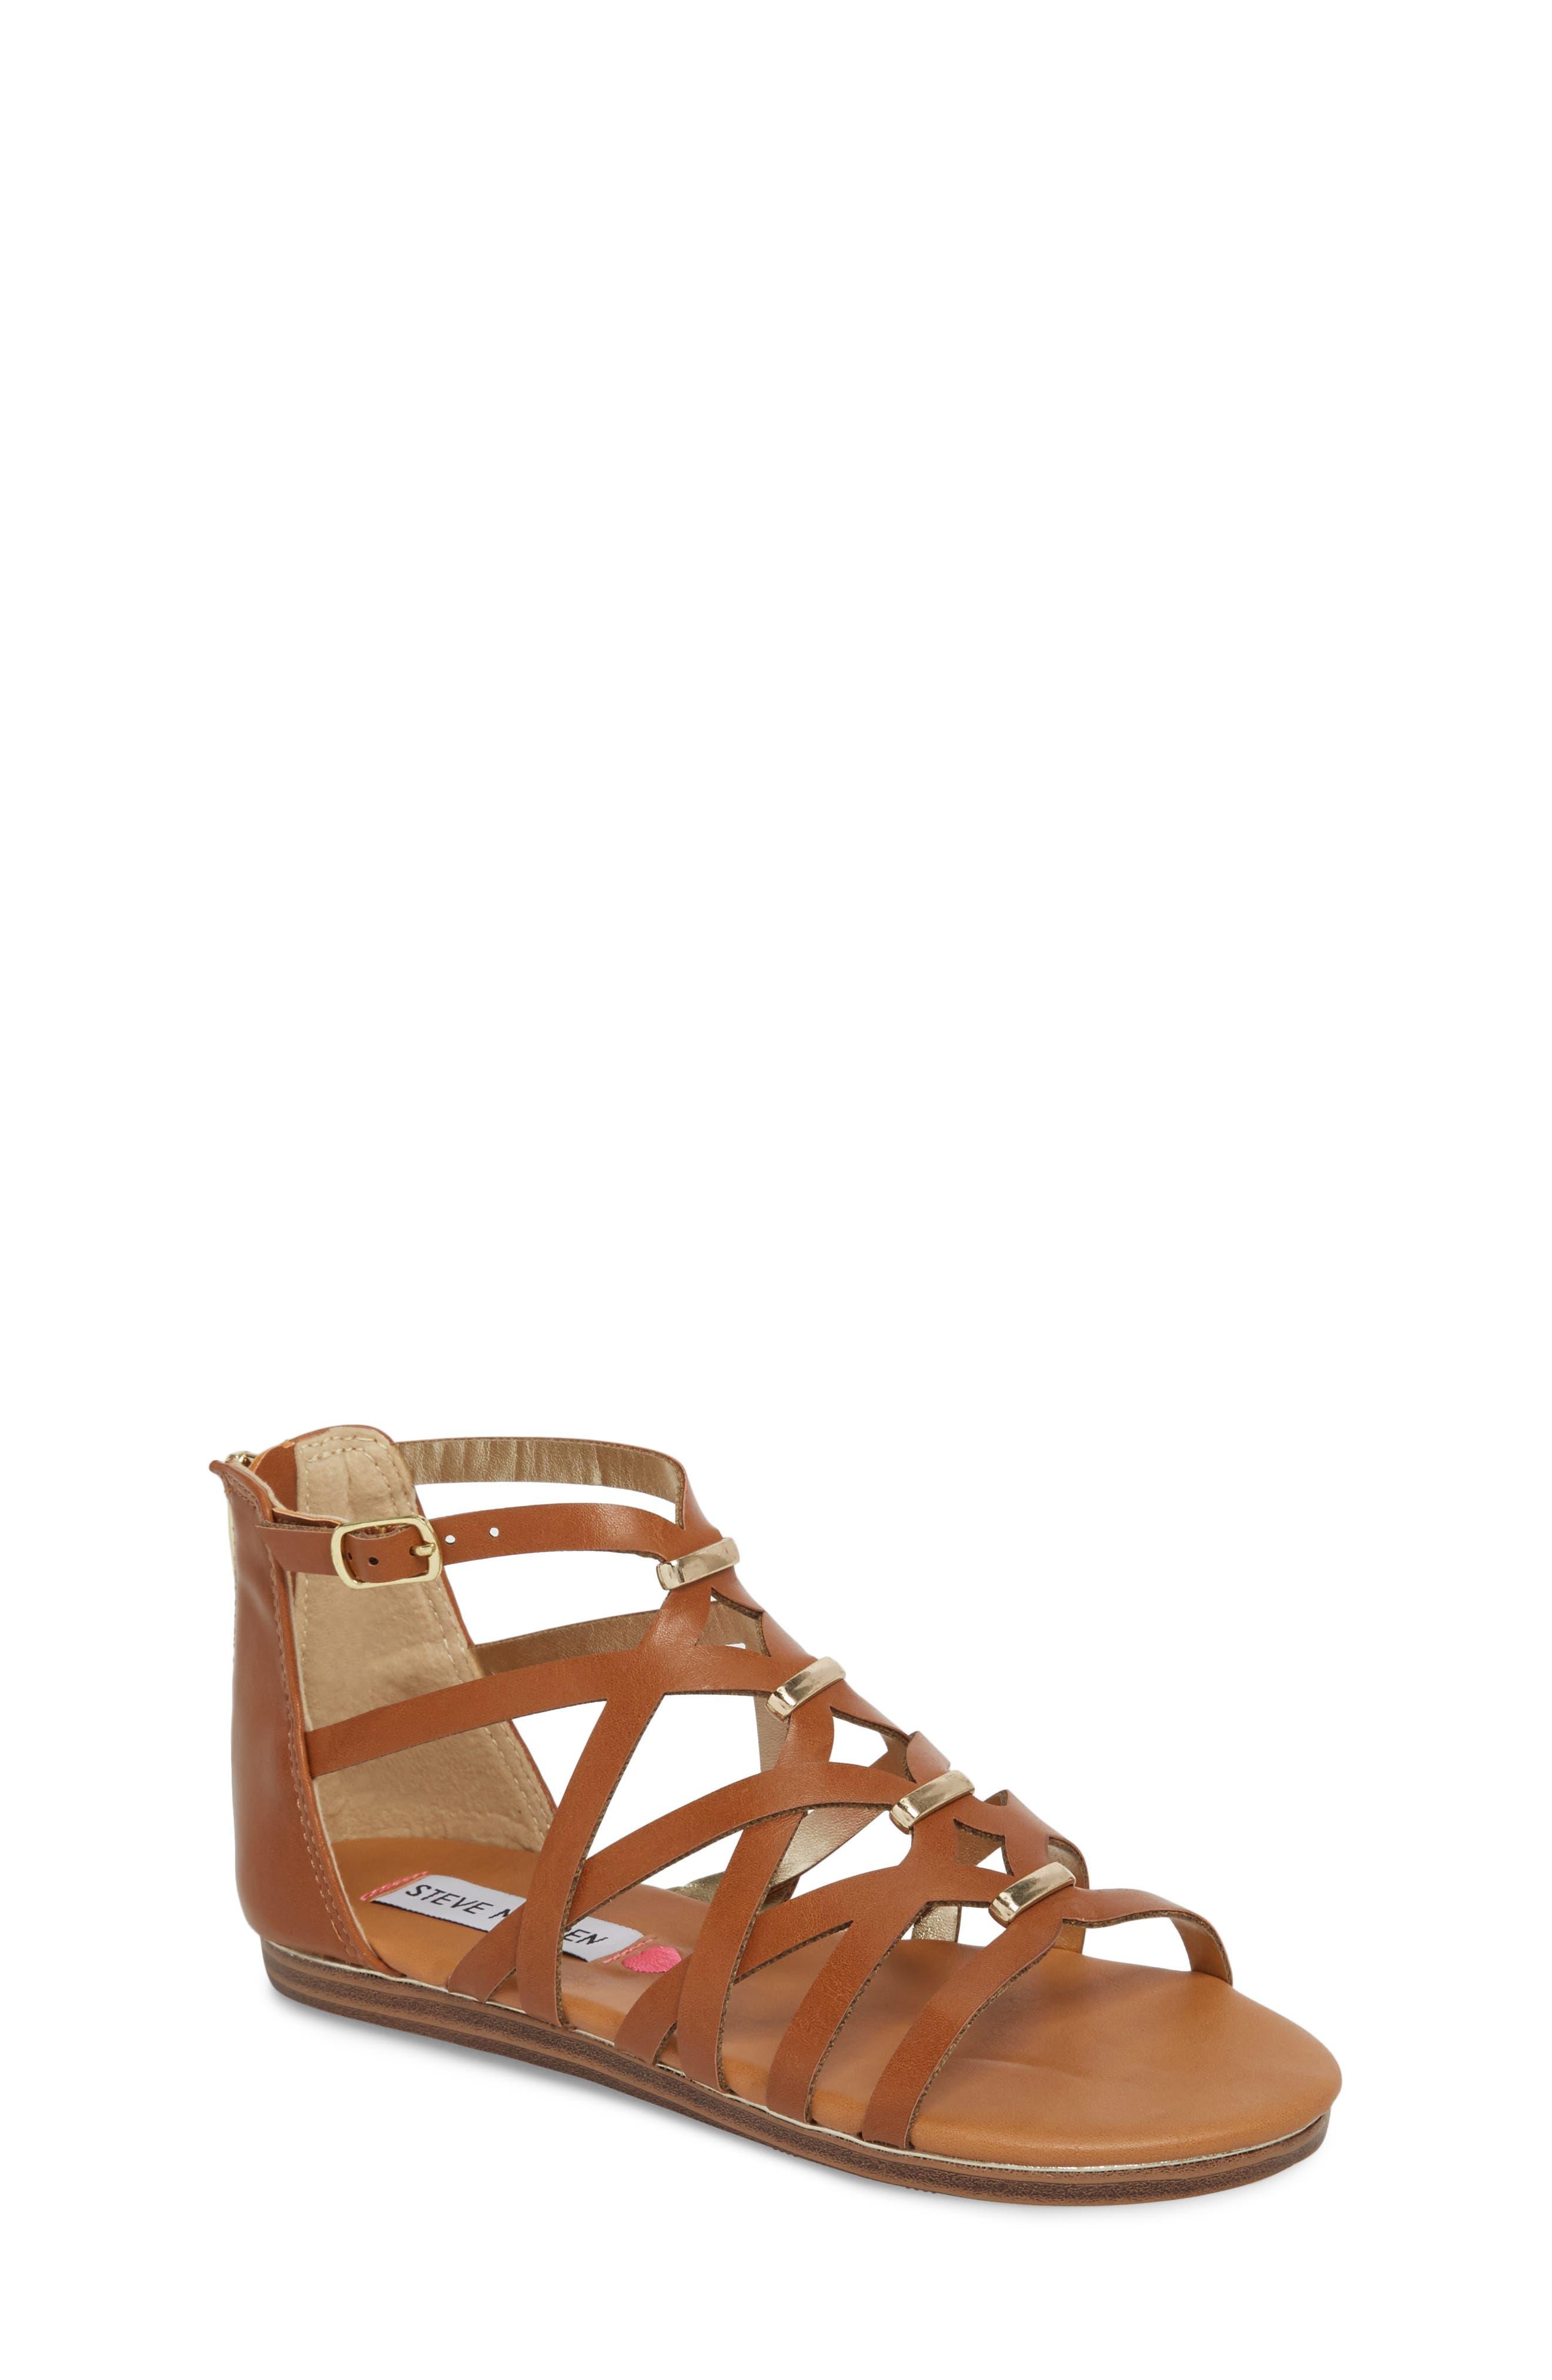 JCOMET Gladiator Sandal,                         Main,                         color,